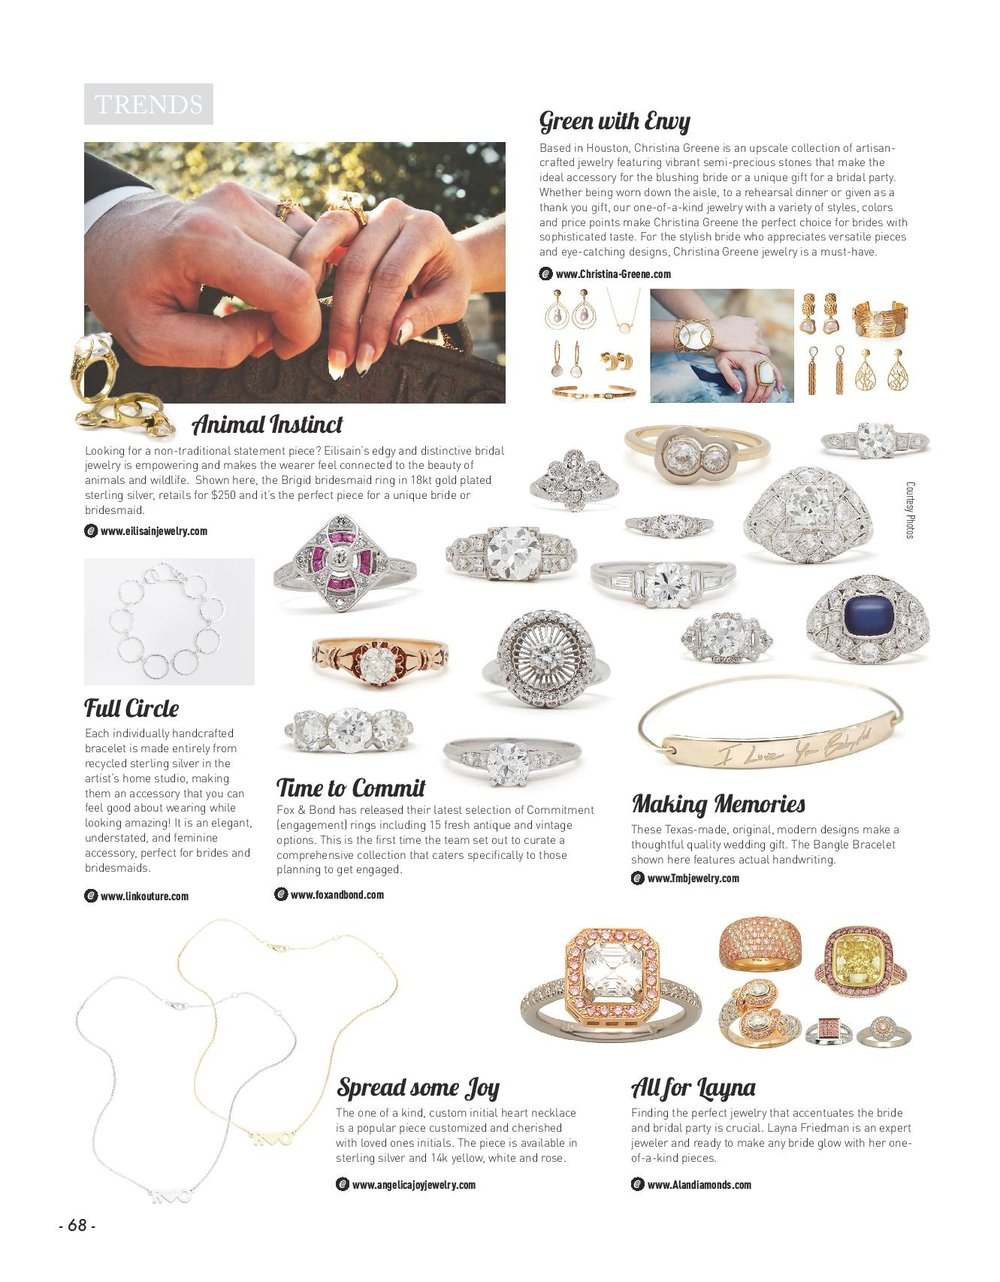 Texas Weddings Magazine - January 2017